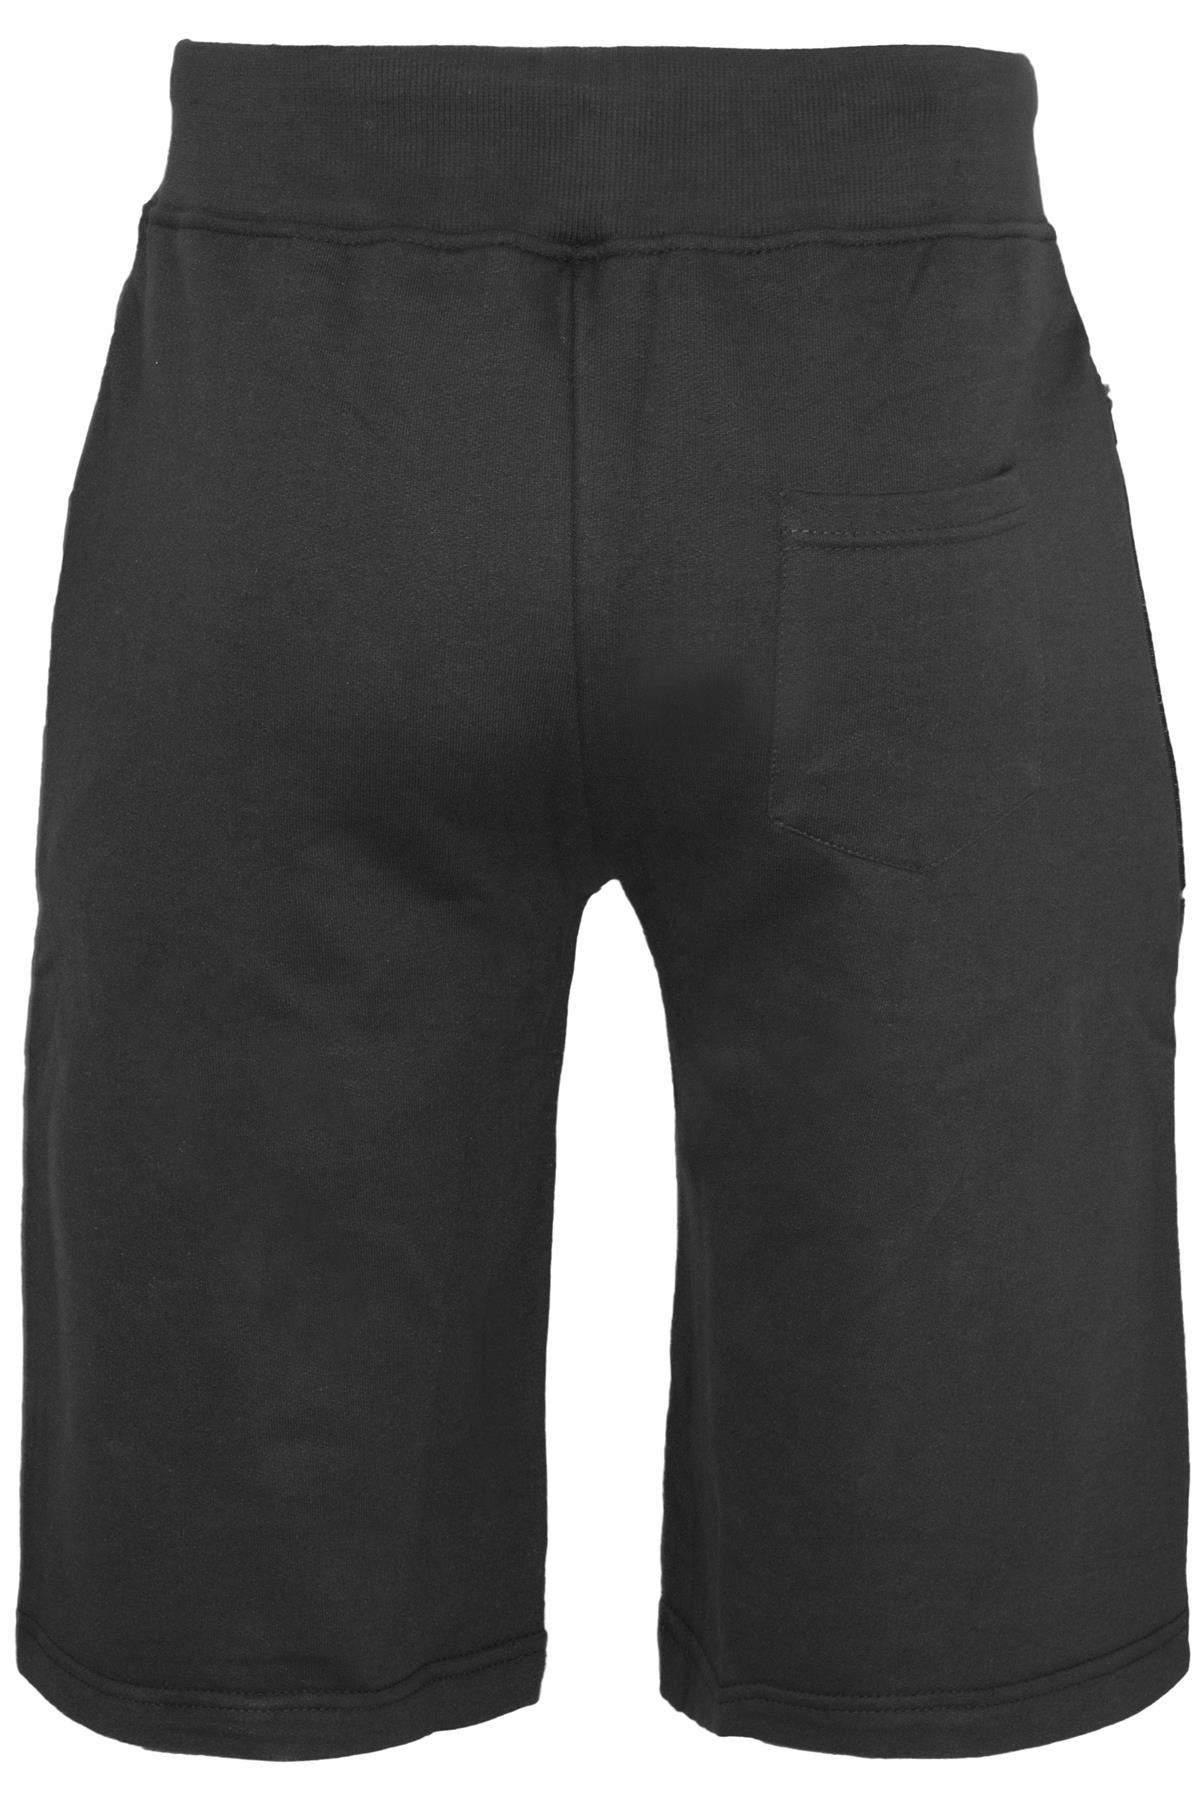 Mens-Contrast-Panel-Running-Summer-Side-Slit-Knee-Length-Fleece-Bottoms-Shorts thumbnail 38